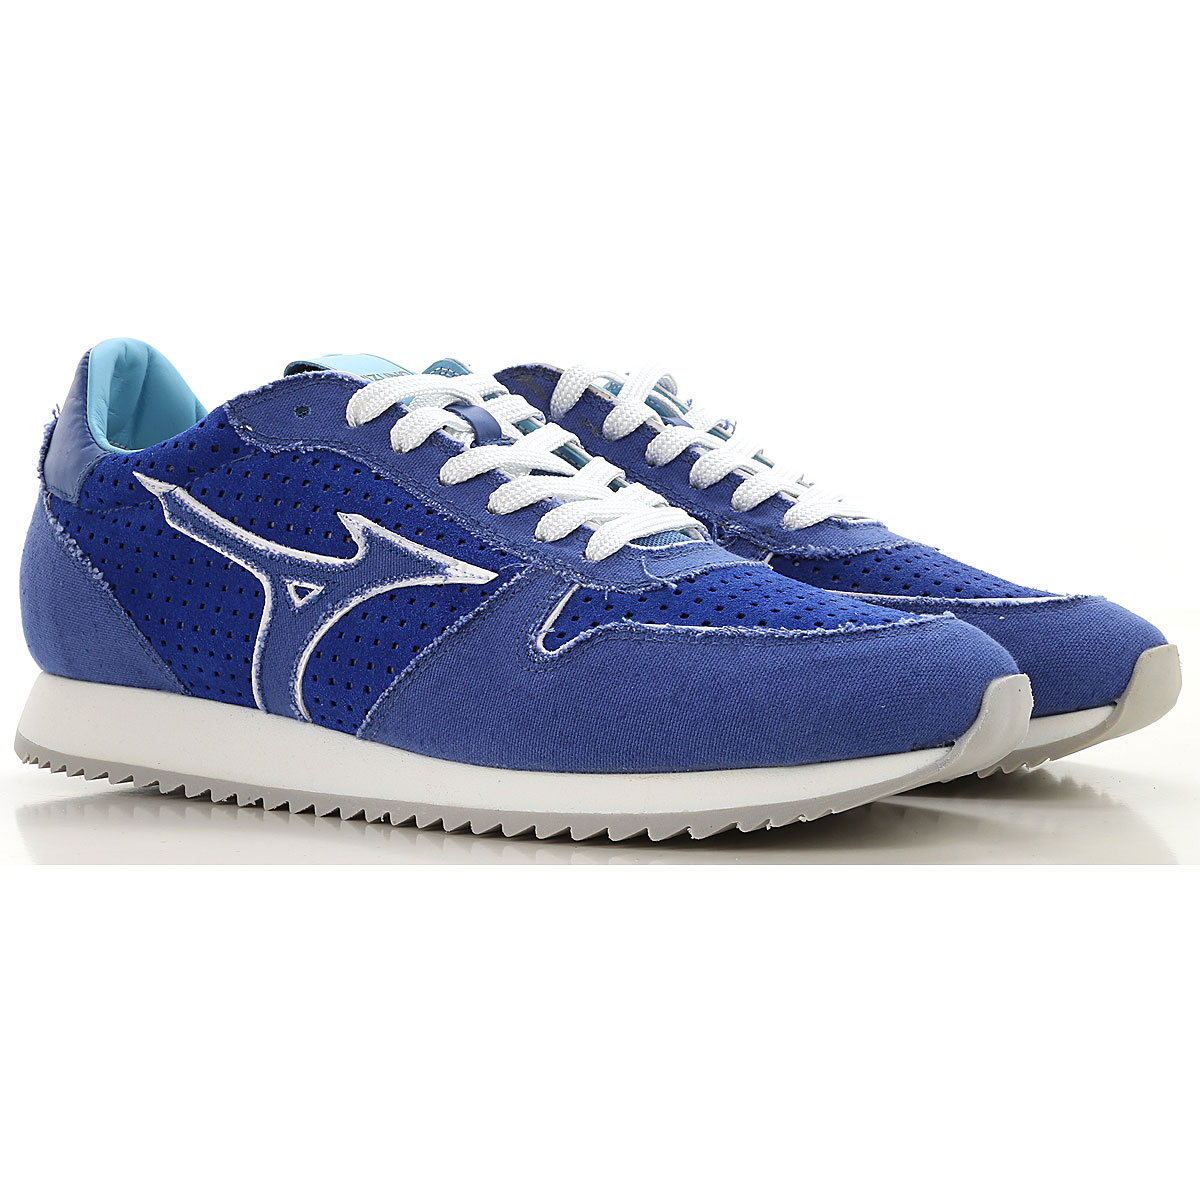 Mizuno Sneakers for Men On Sale in Outlet, Blue, Leather, 2019, US 7 5 - UK 6 5 - EU 40 - JP 25.5 US 8 5 - UK 7.5 - EU 41 - JP 26 5 US 11 5 - UK 10 5